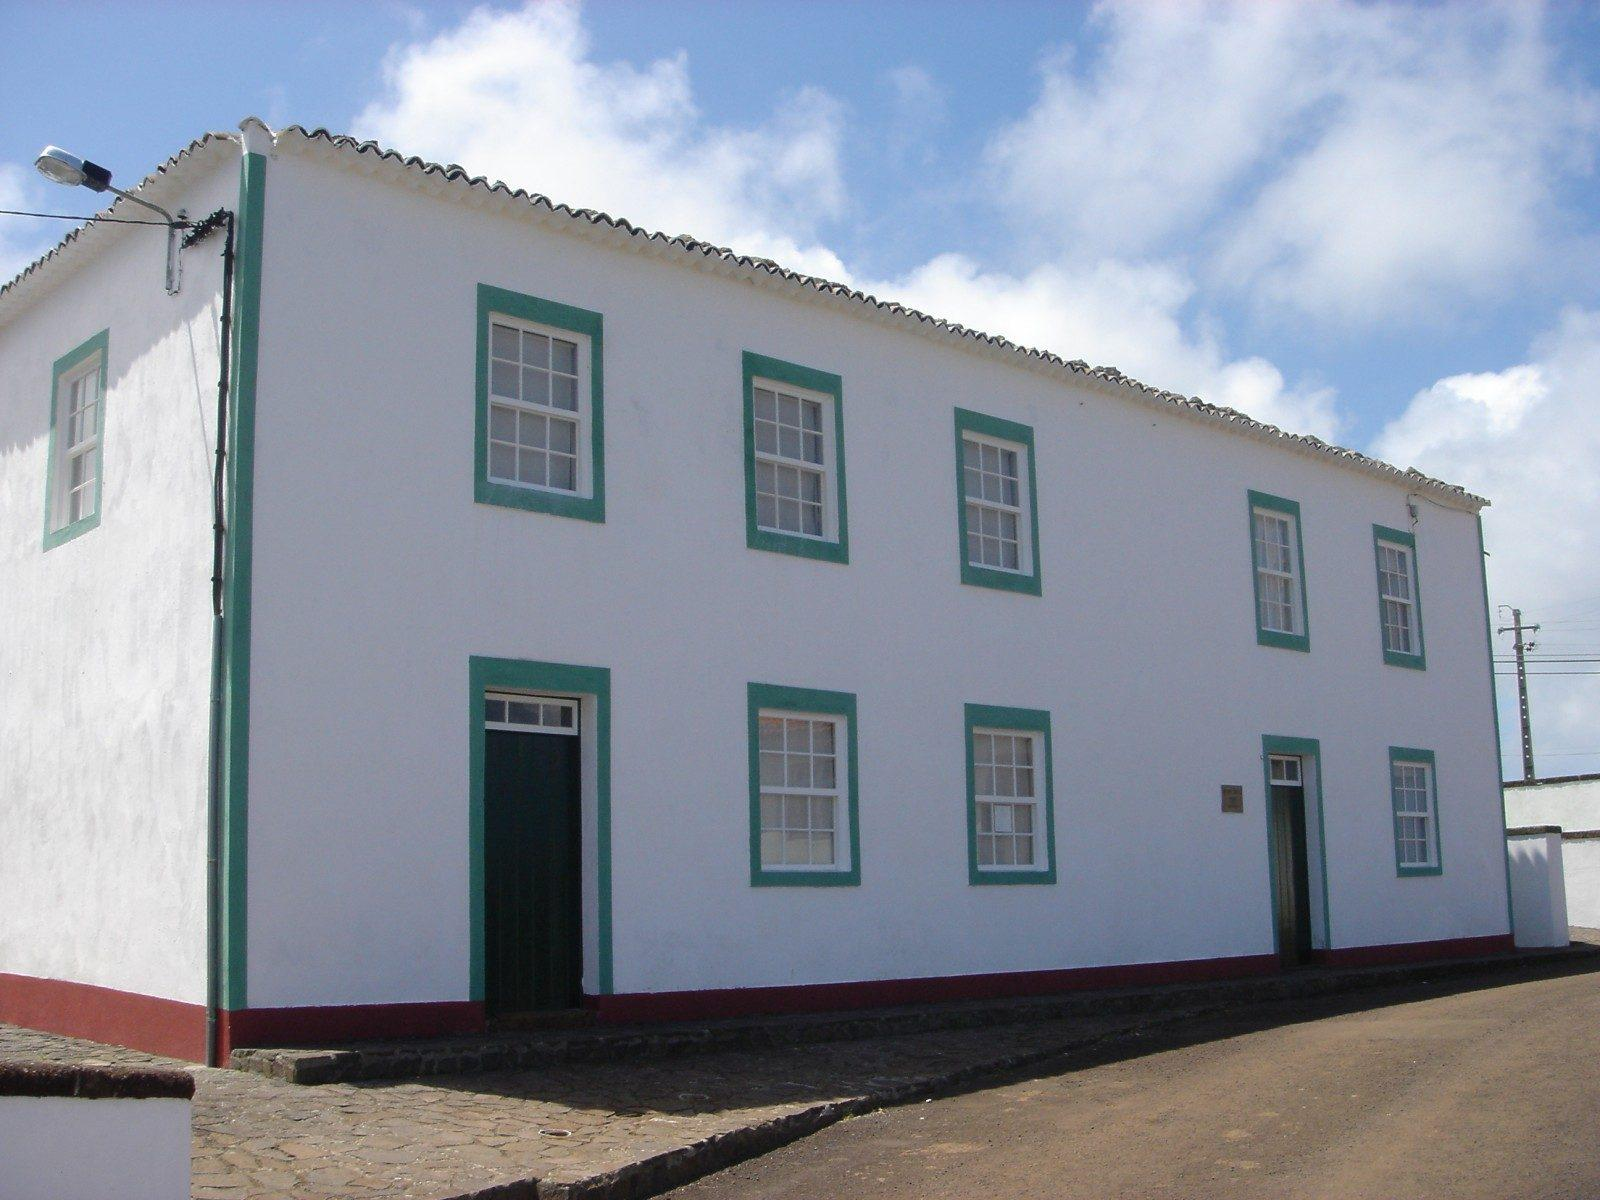 Museu de Santa Maria, Açores